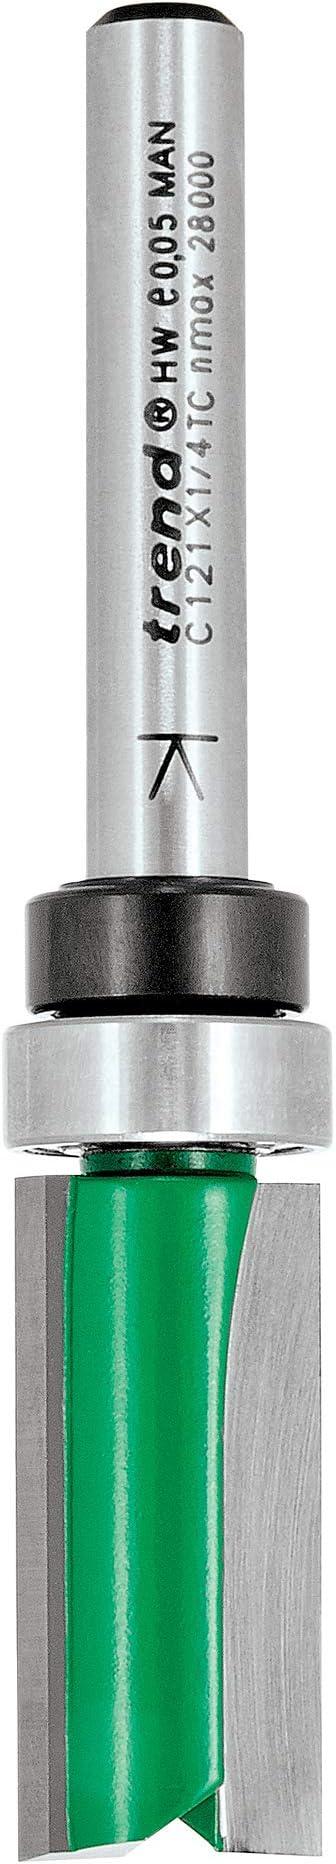 TREND C121X1//4TC TEMPLATE//PROFILE 12.7MM DIA